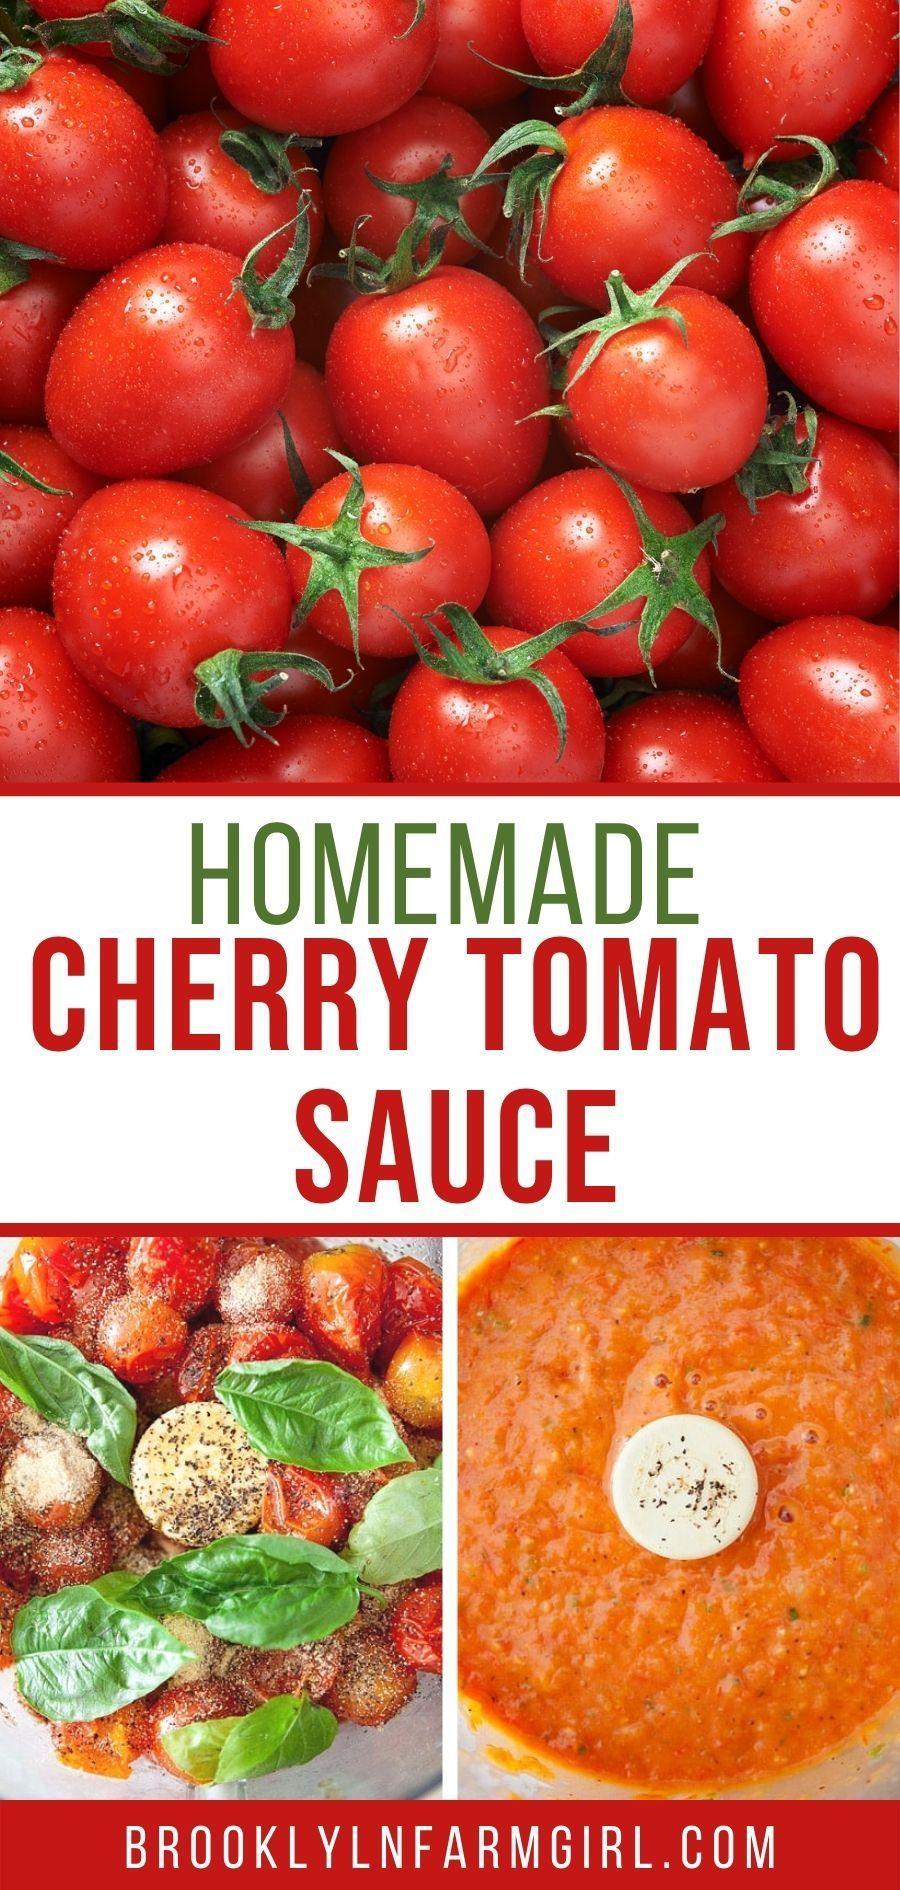 1eaa5b5ff2ac7b11582bff344b442cae - Cherry Tomato Pie Better Homes And Gardens